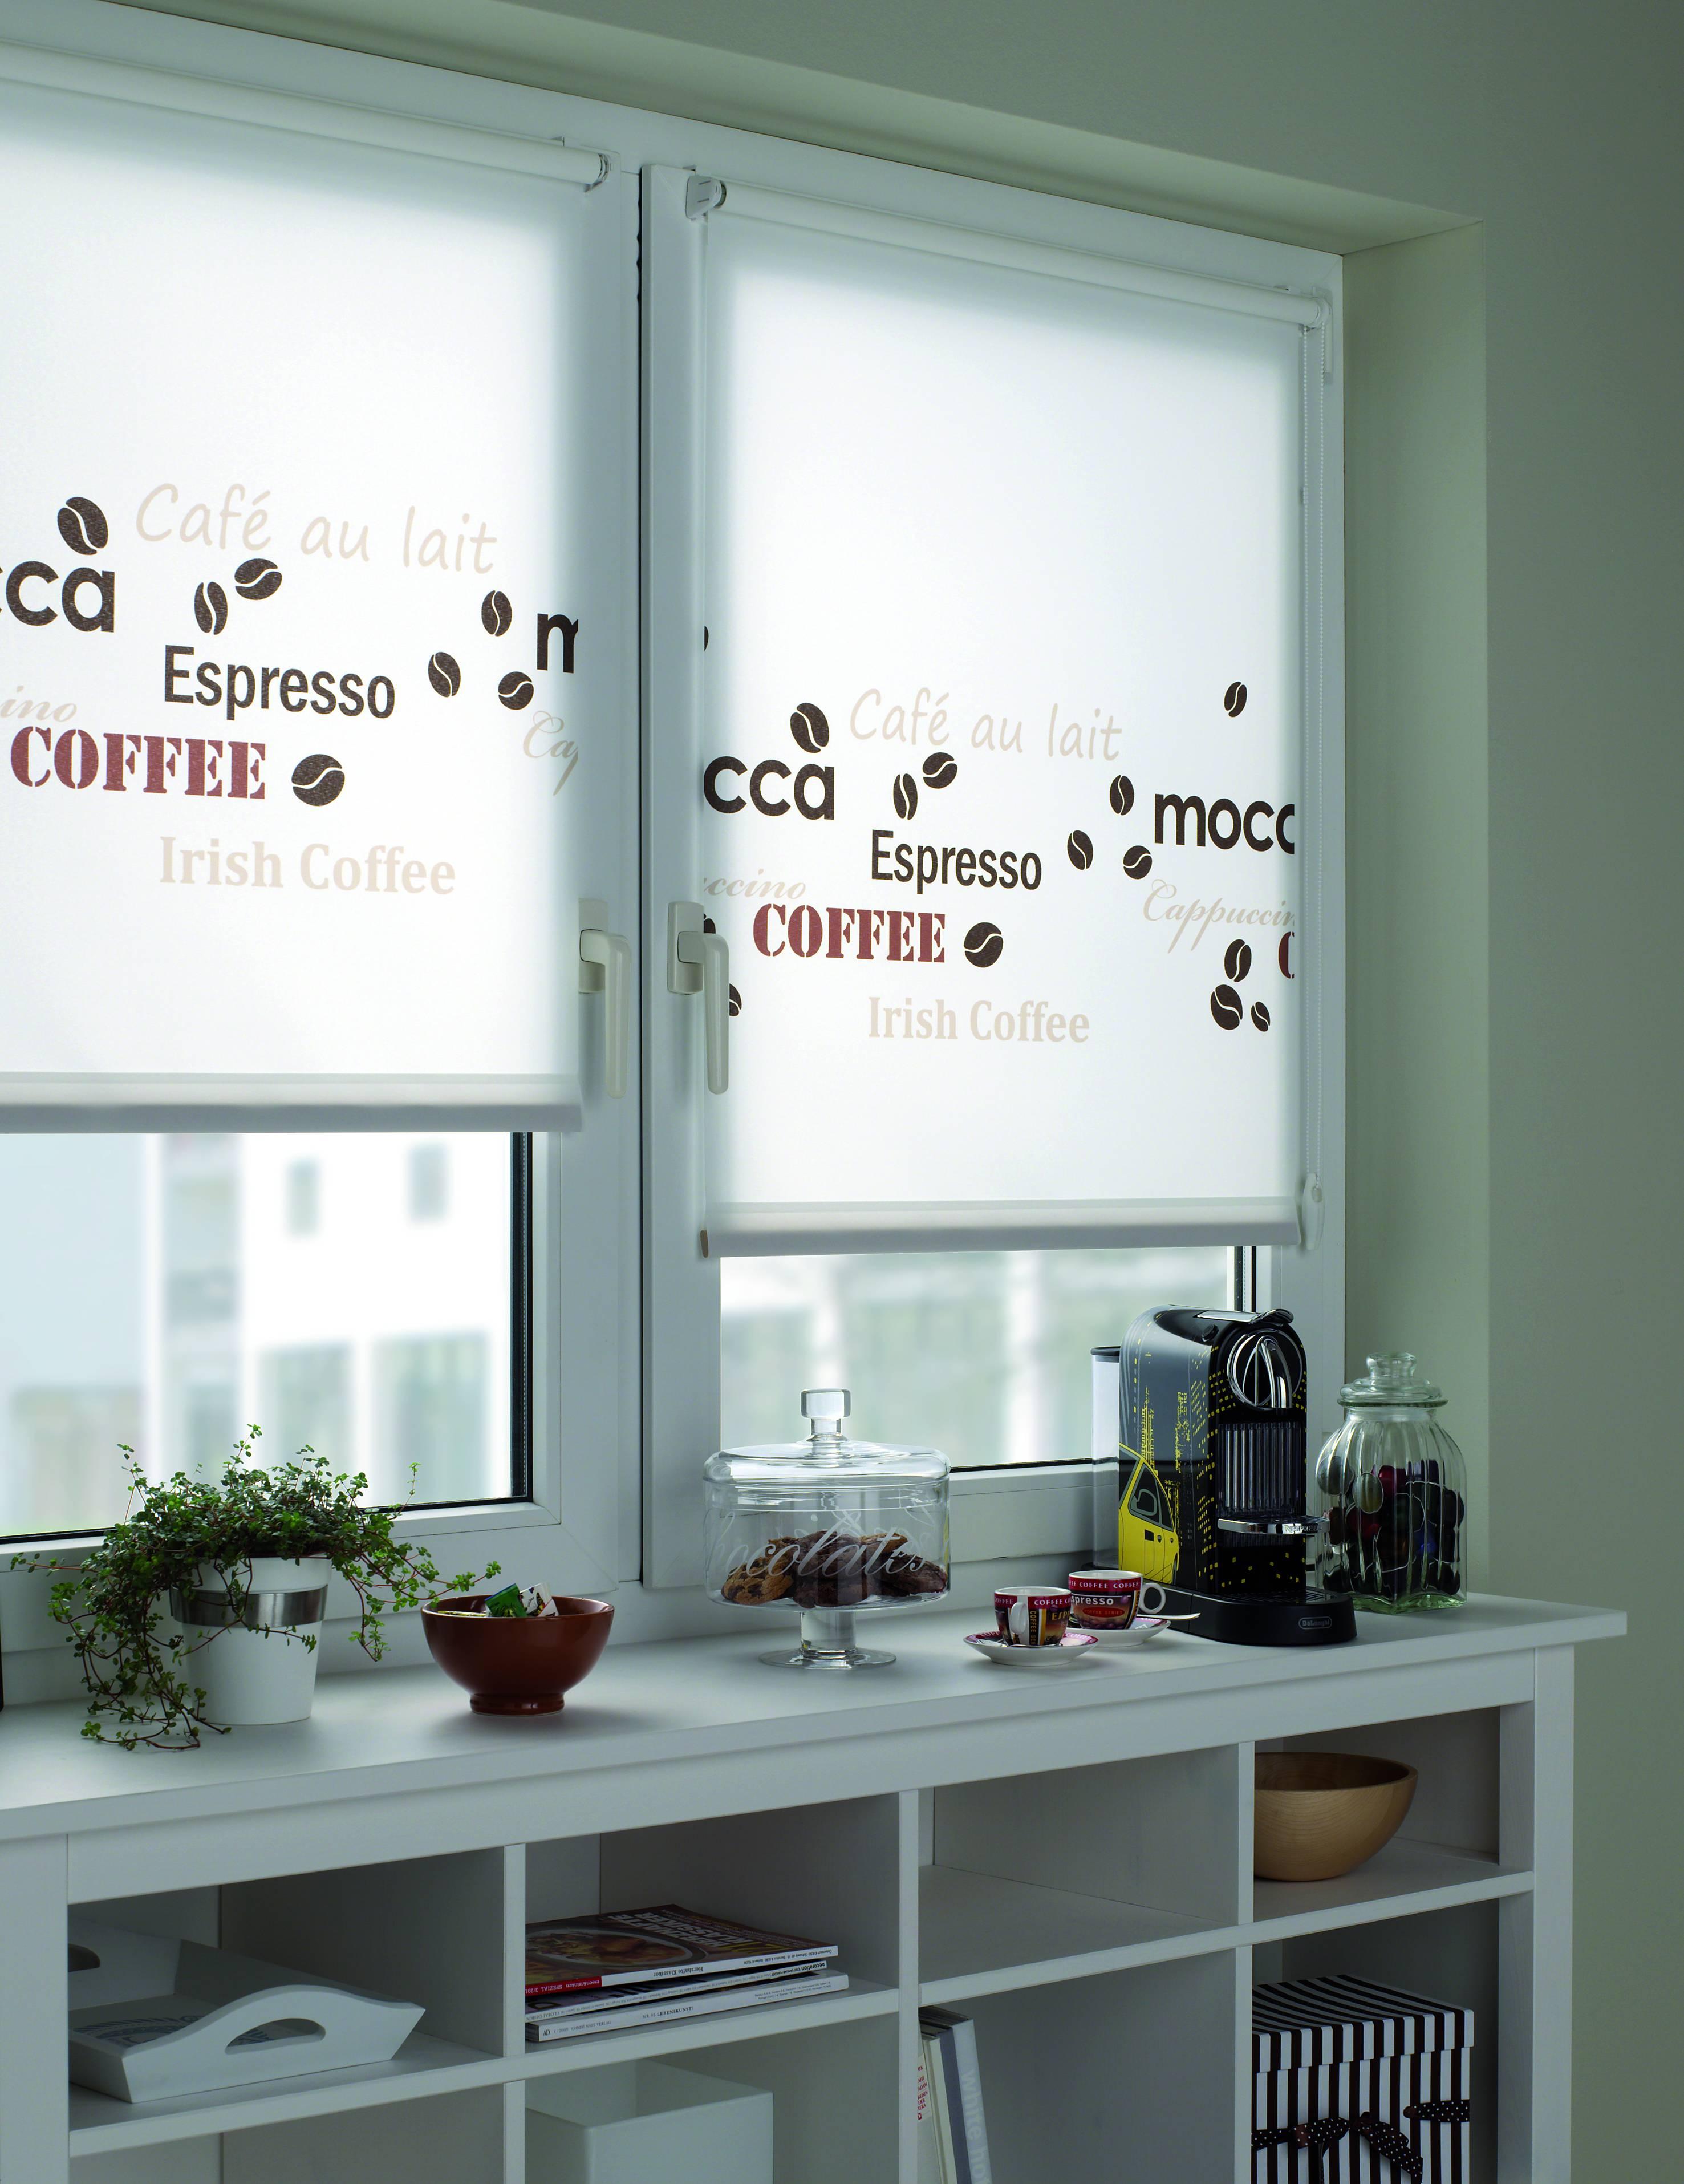 easyfix rollo coffee 60 x 150 cm 30934. Black Bedroom Furniture Sets. Home Design Ideas